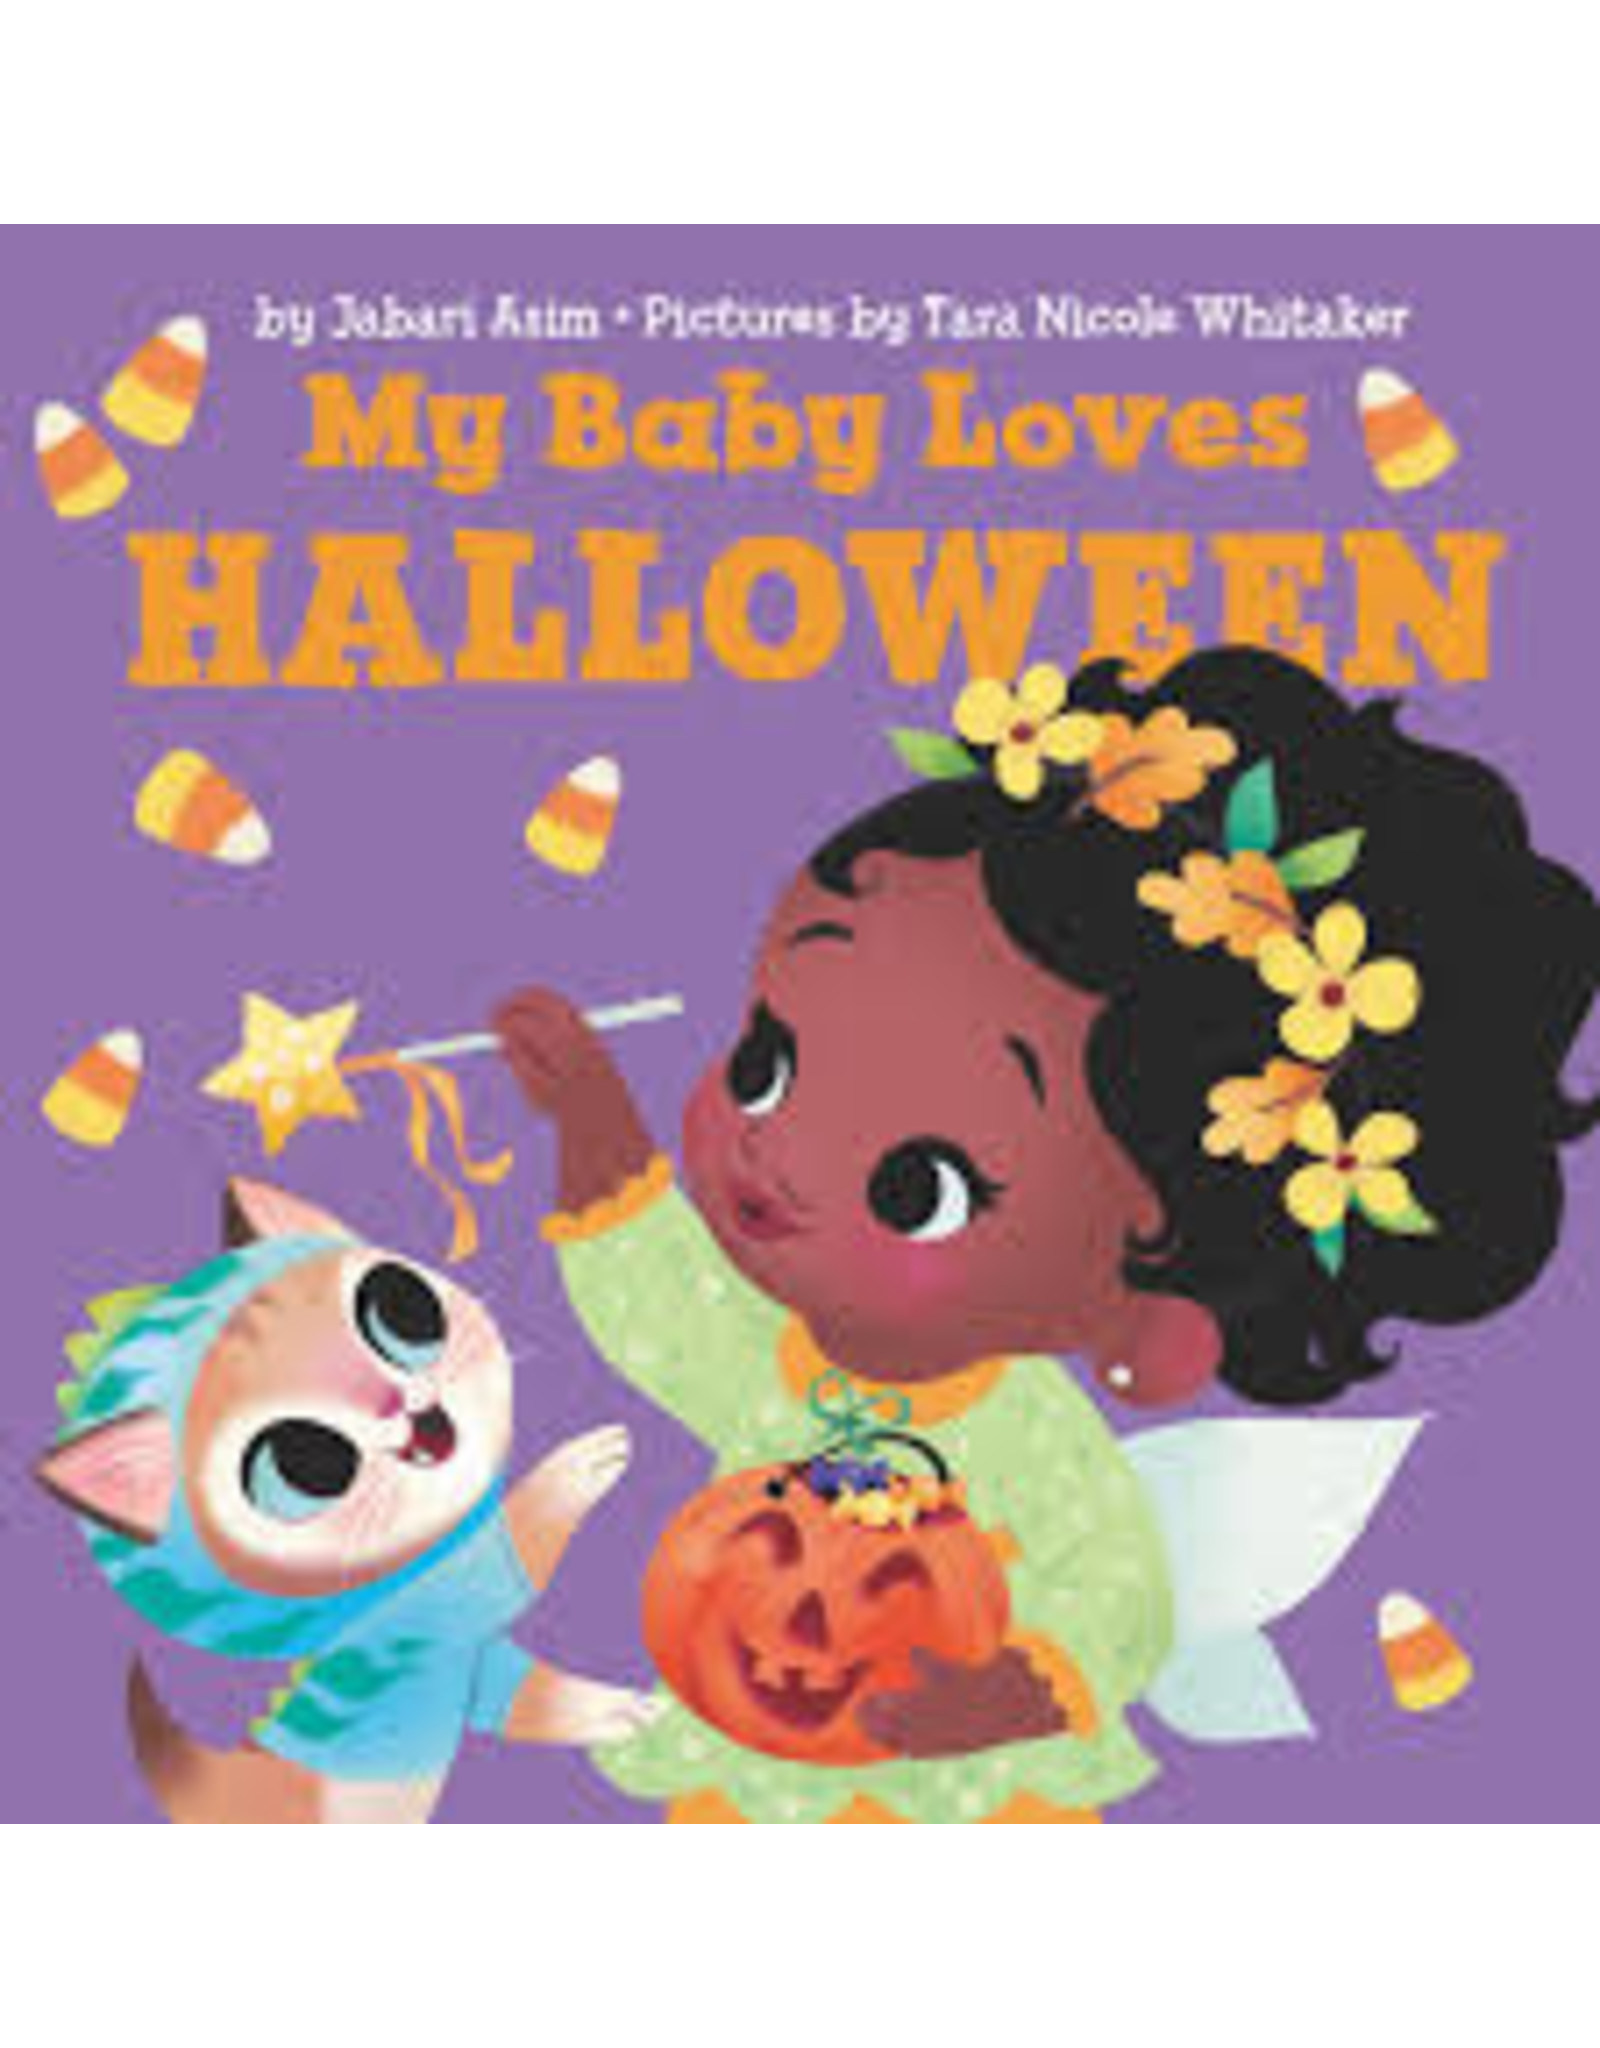 Books My Baby Loves Halloween by Jabari Asim